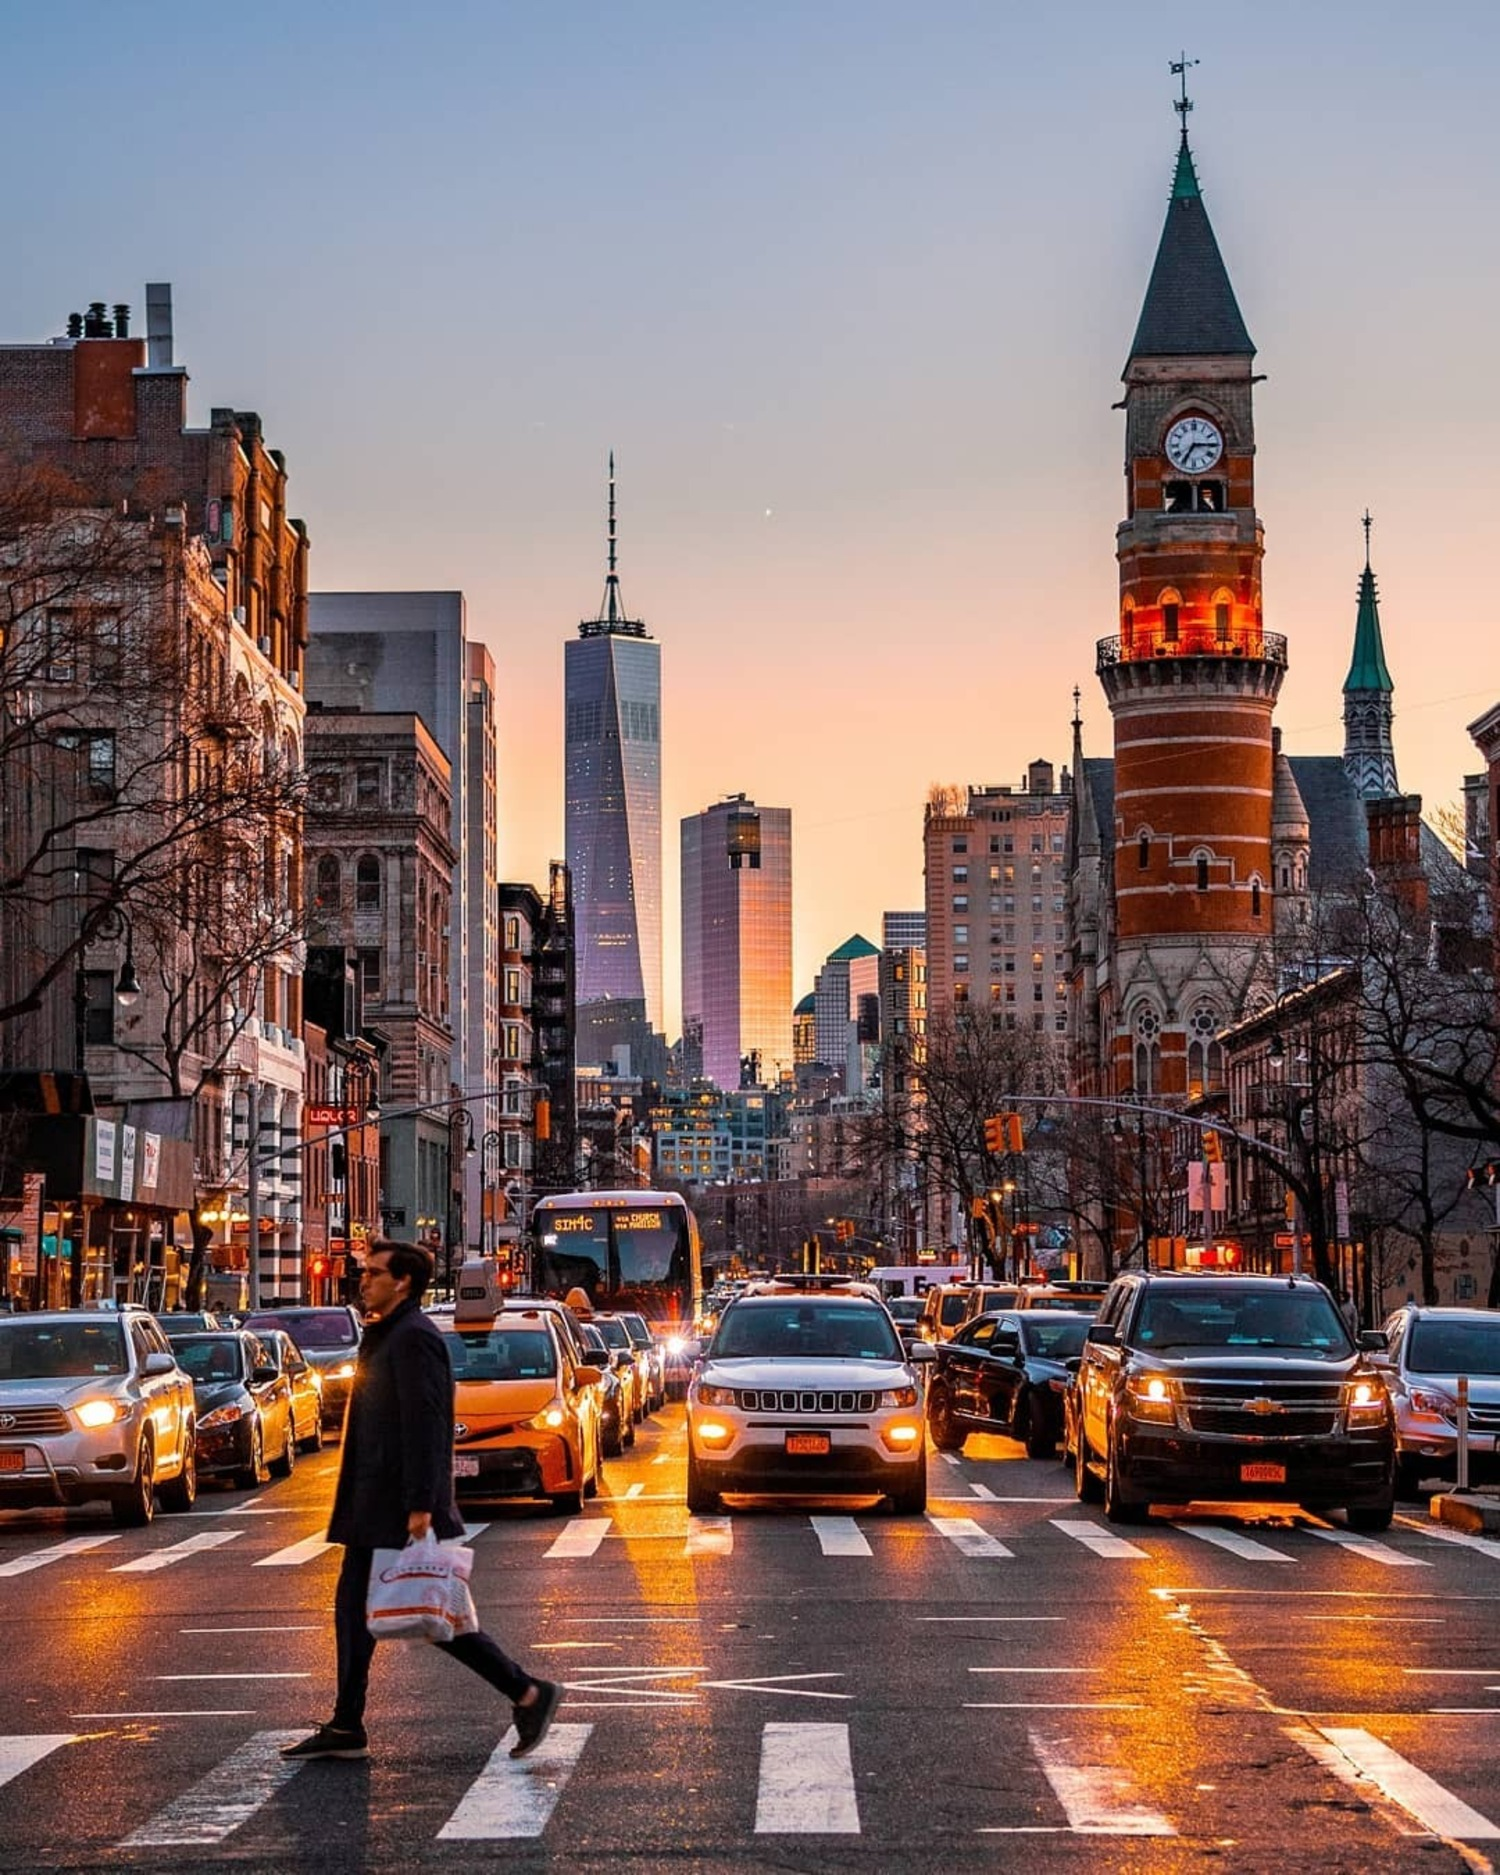 6th Avenue and West 14th Street, Manhattan